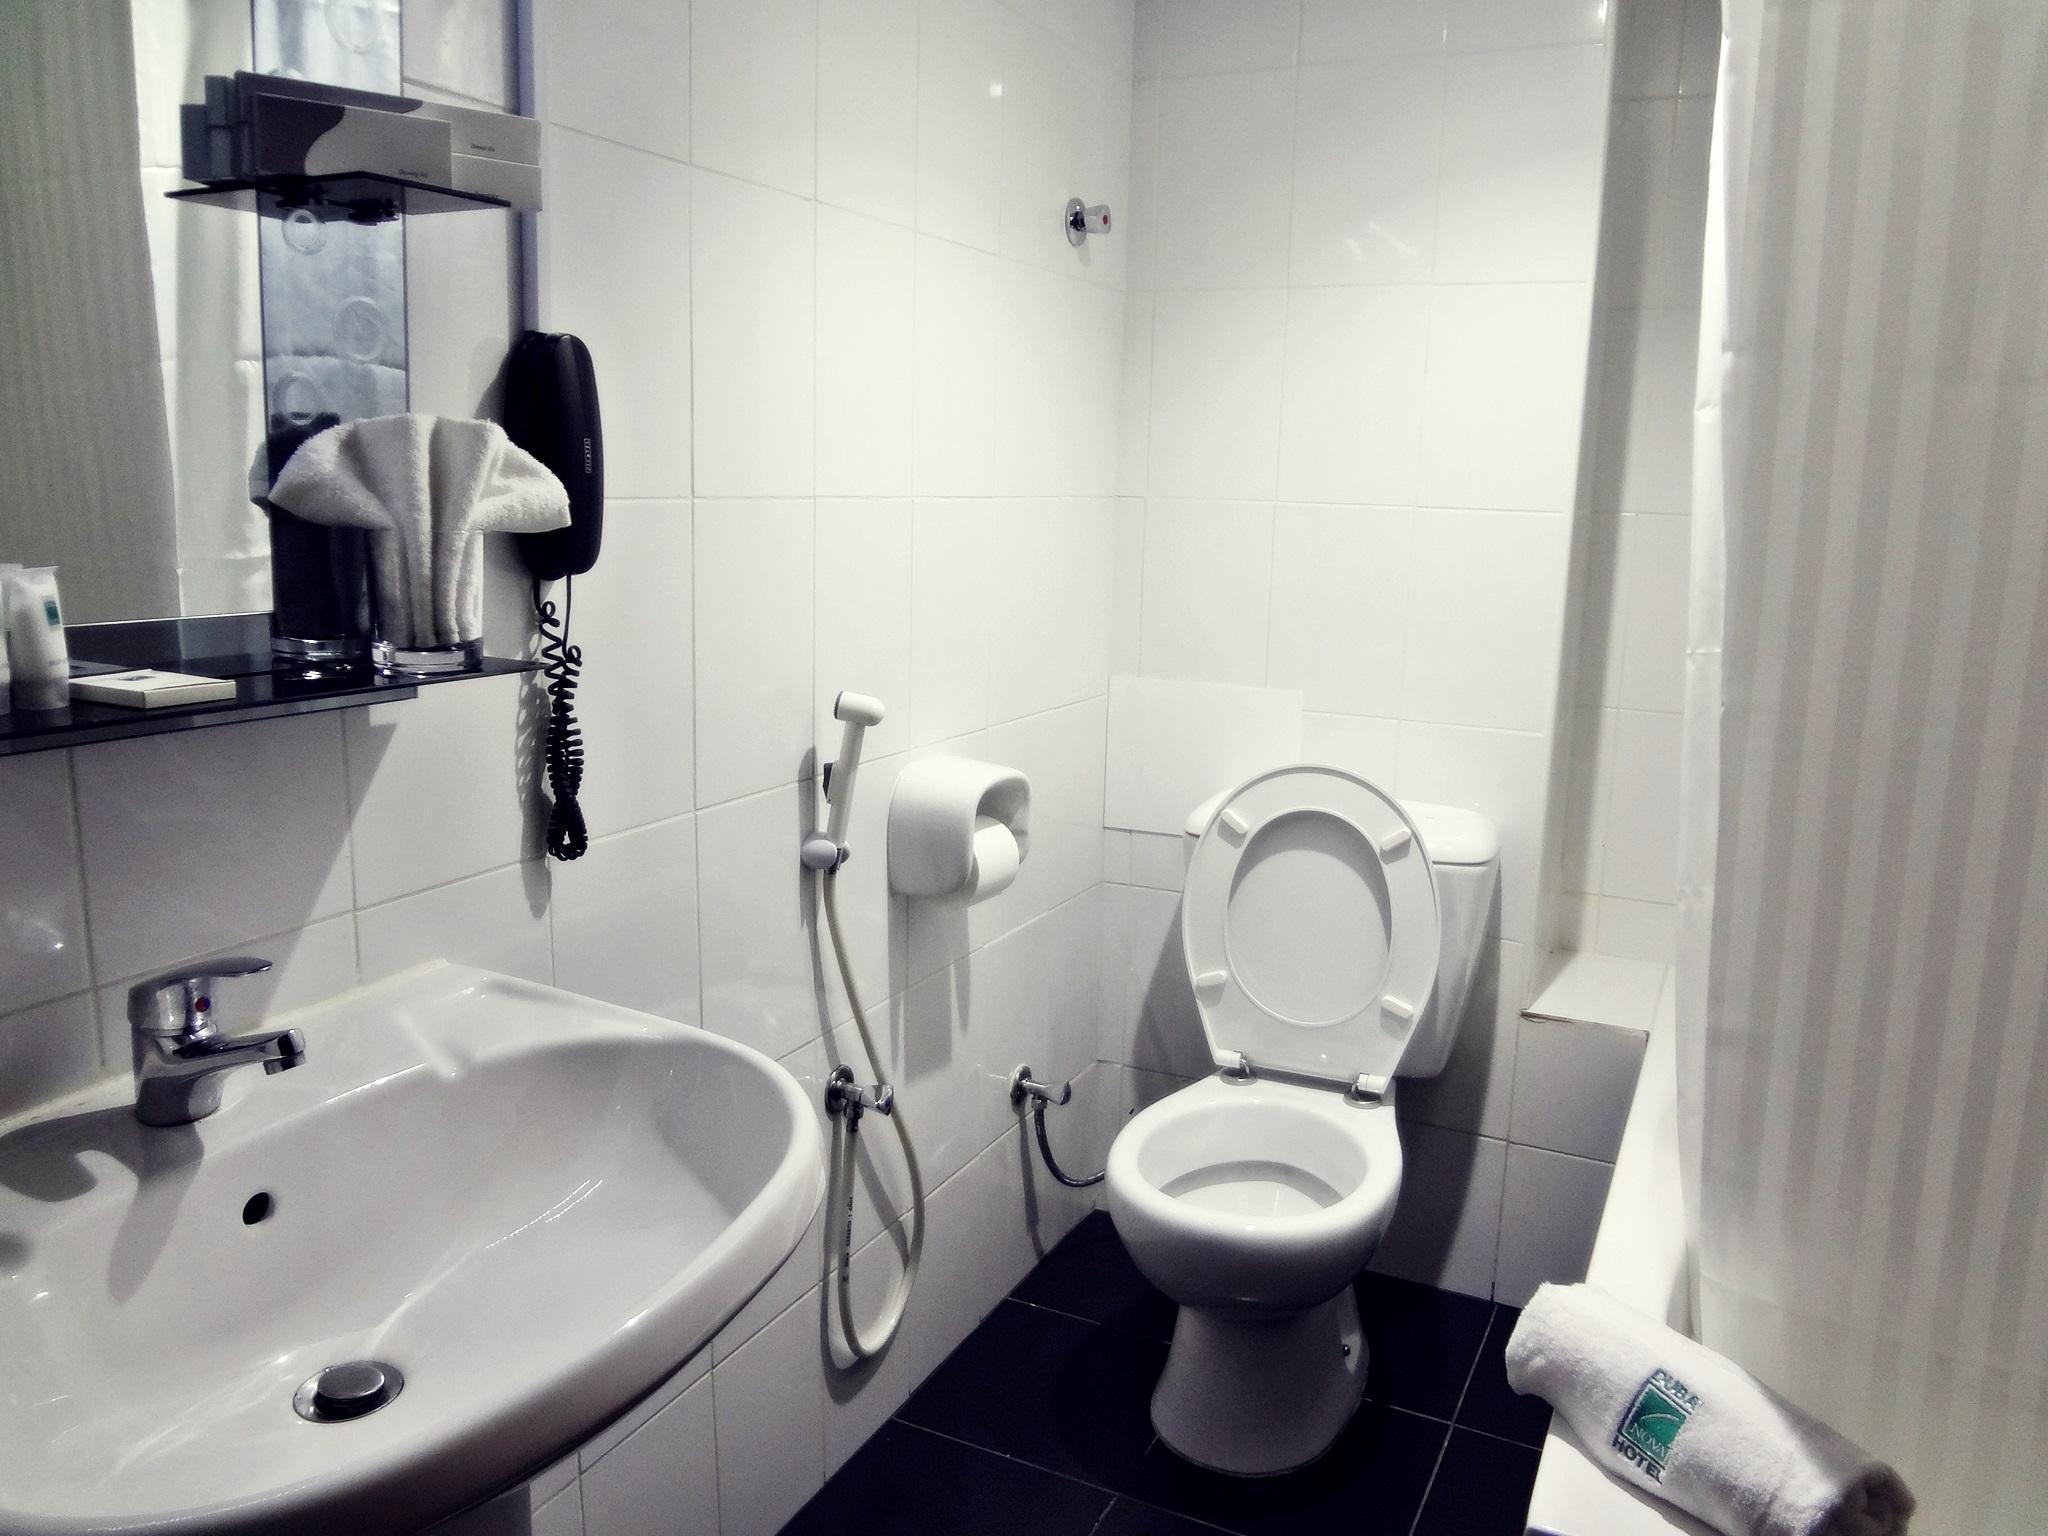 Mens toilet bur dubai bus station